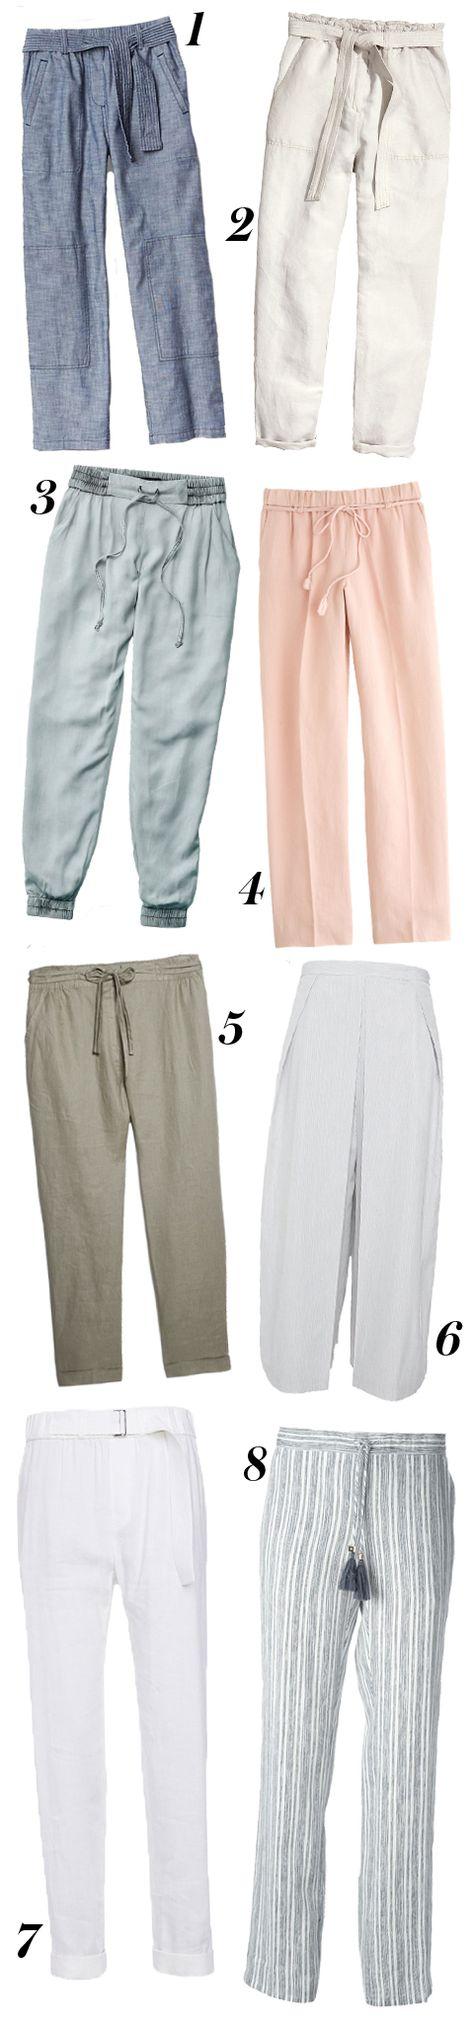 7 Ideas De Pantalones De Tobillo Pantalones Pantalones De Moda Ropa